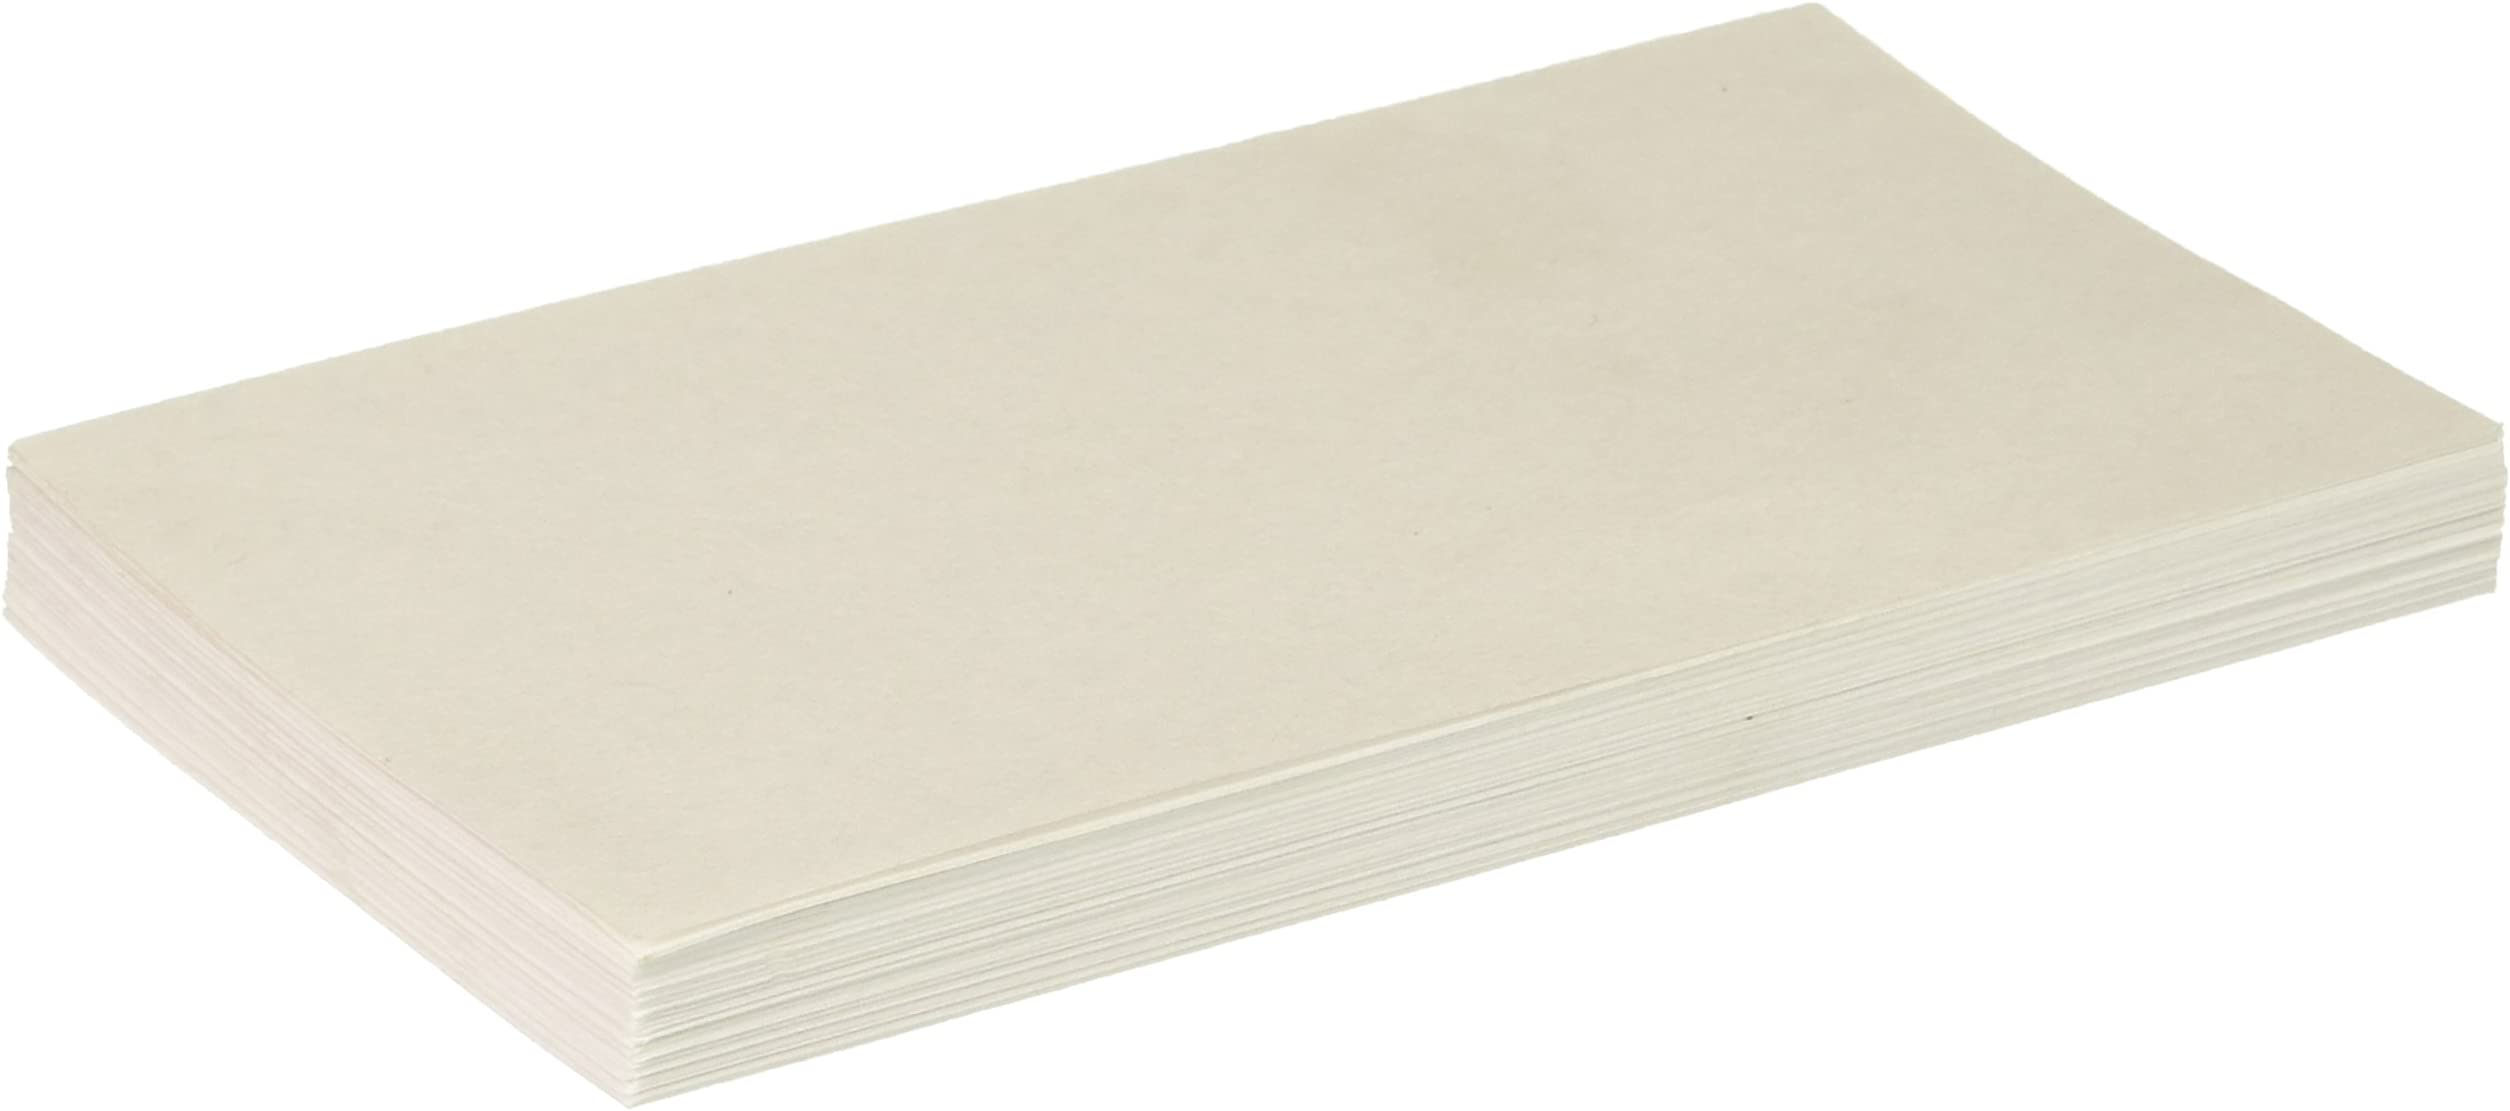 Polaroid Inspired  \u2013 Kraft Envelopes Included 6 Count Blank Folded Note Card Set Travel Themed 5.5\u201d H x 4.25\u201d W \u2013 Original Paintings